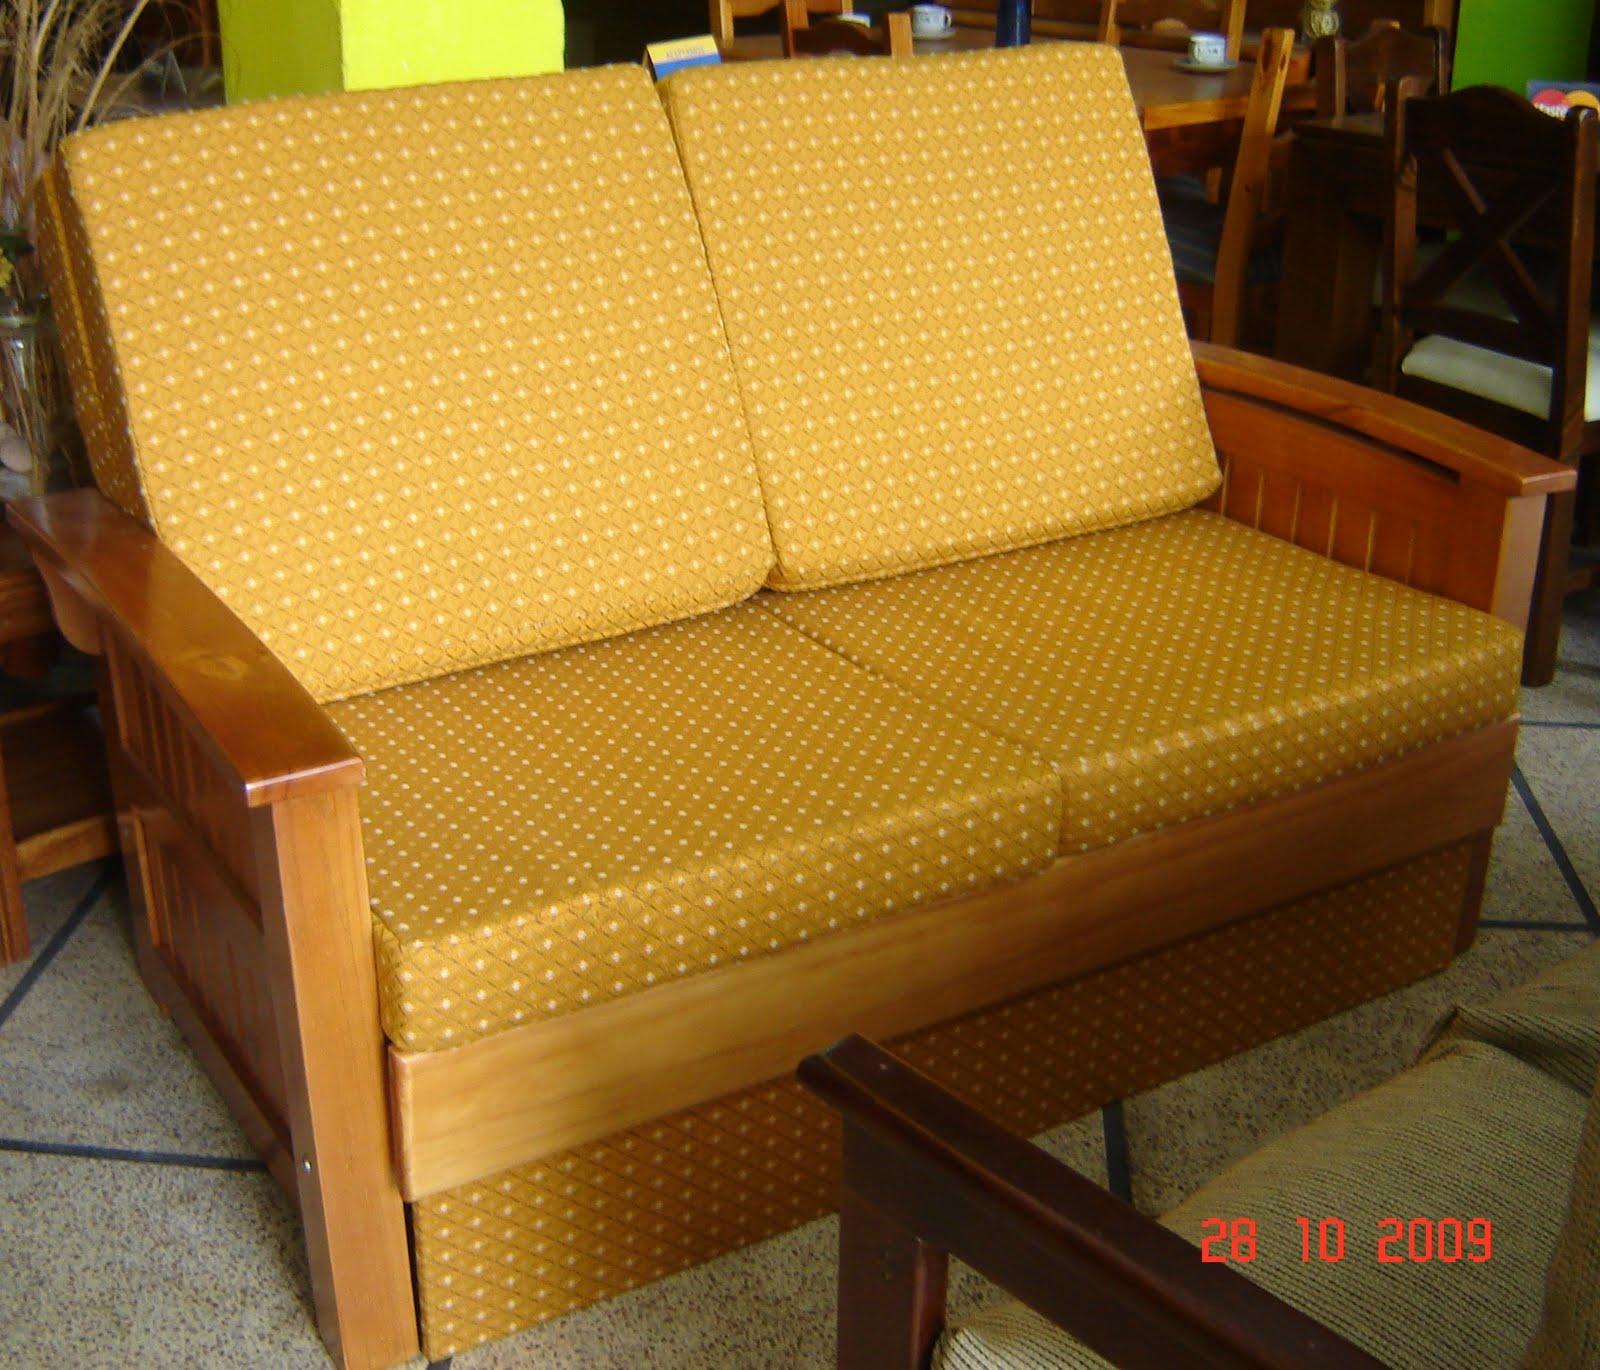 Muebles a tu medida sofa cama de 2 plazas - Medidas sofa cama 2 plazas ...